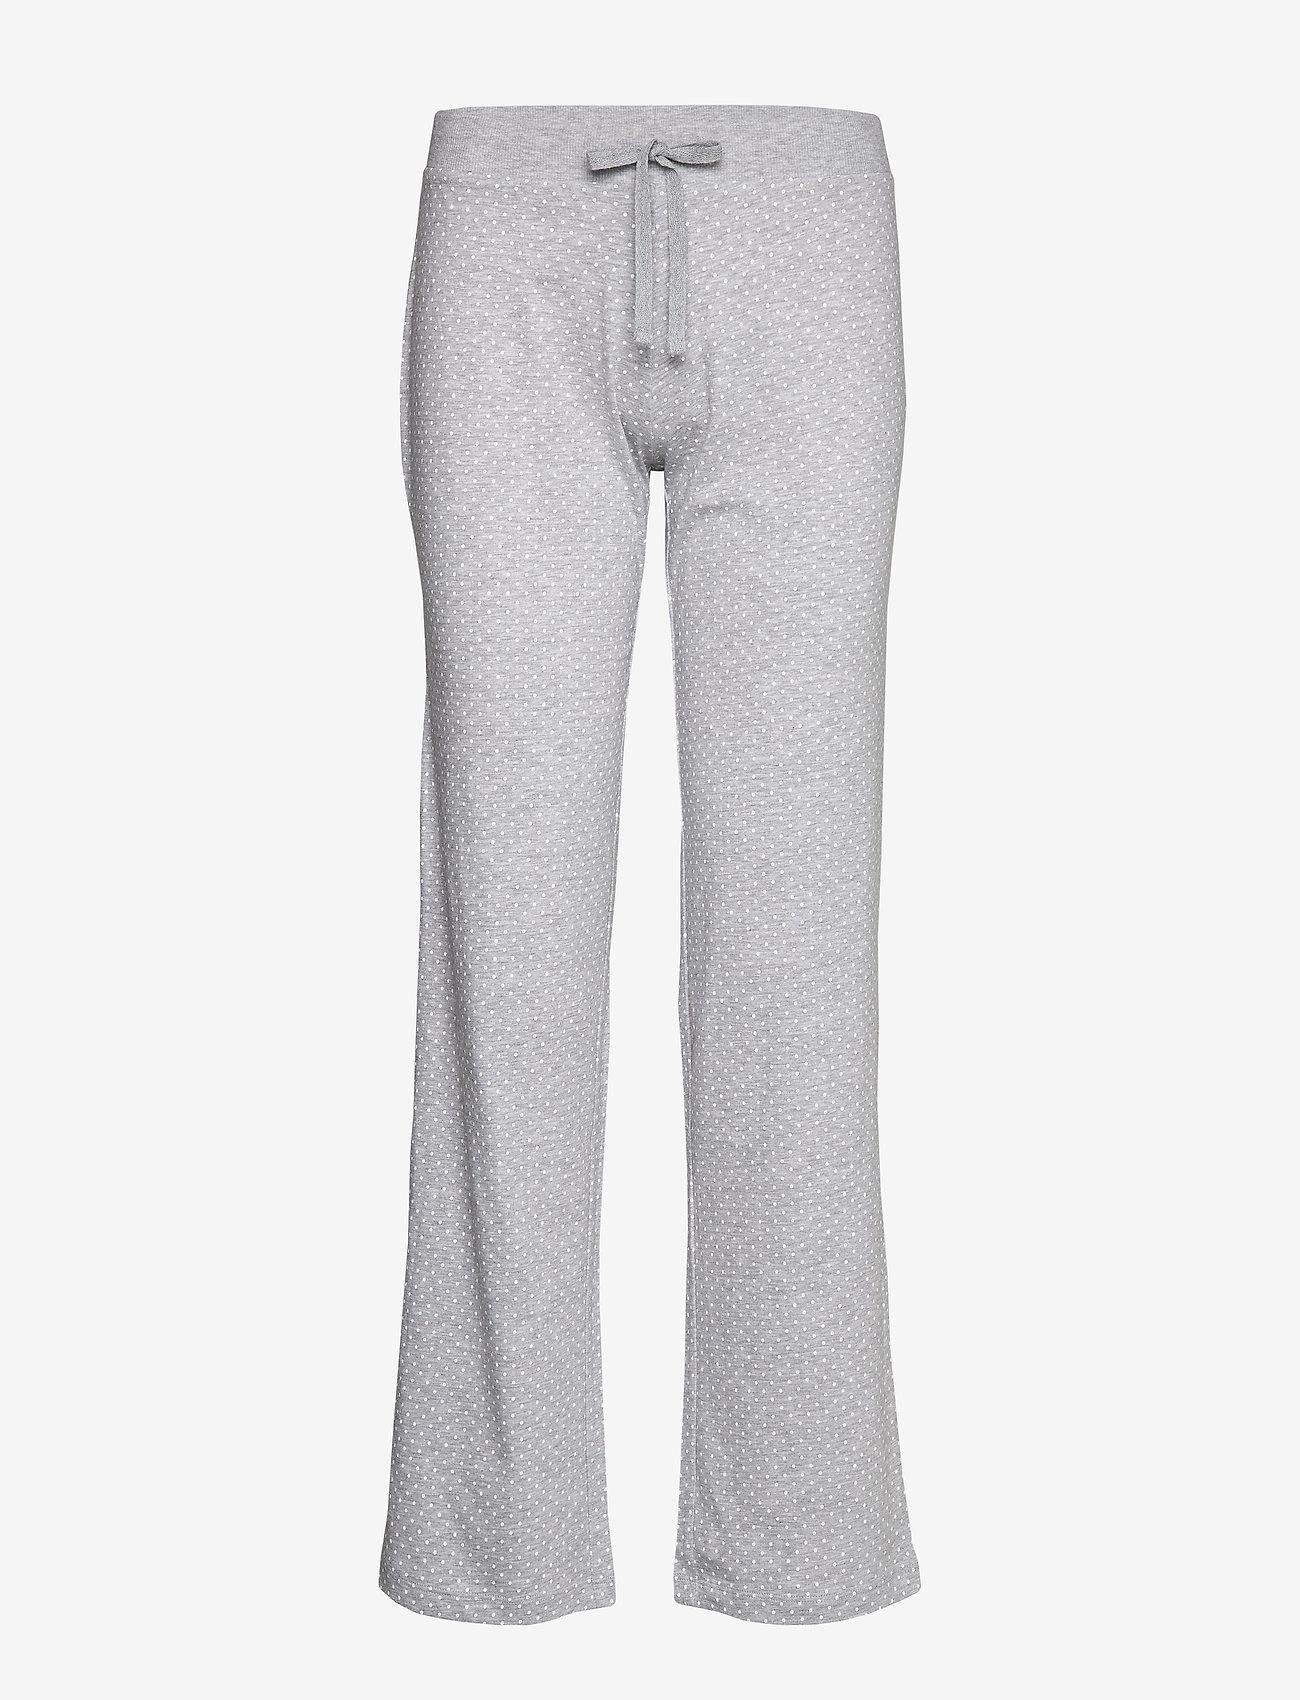 Esprit Bodywear Women - Nightpants - doły - light grey - 0